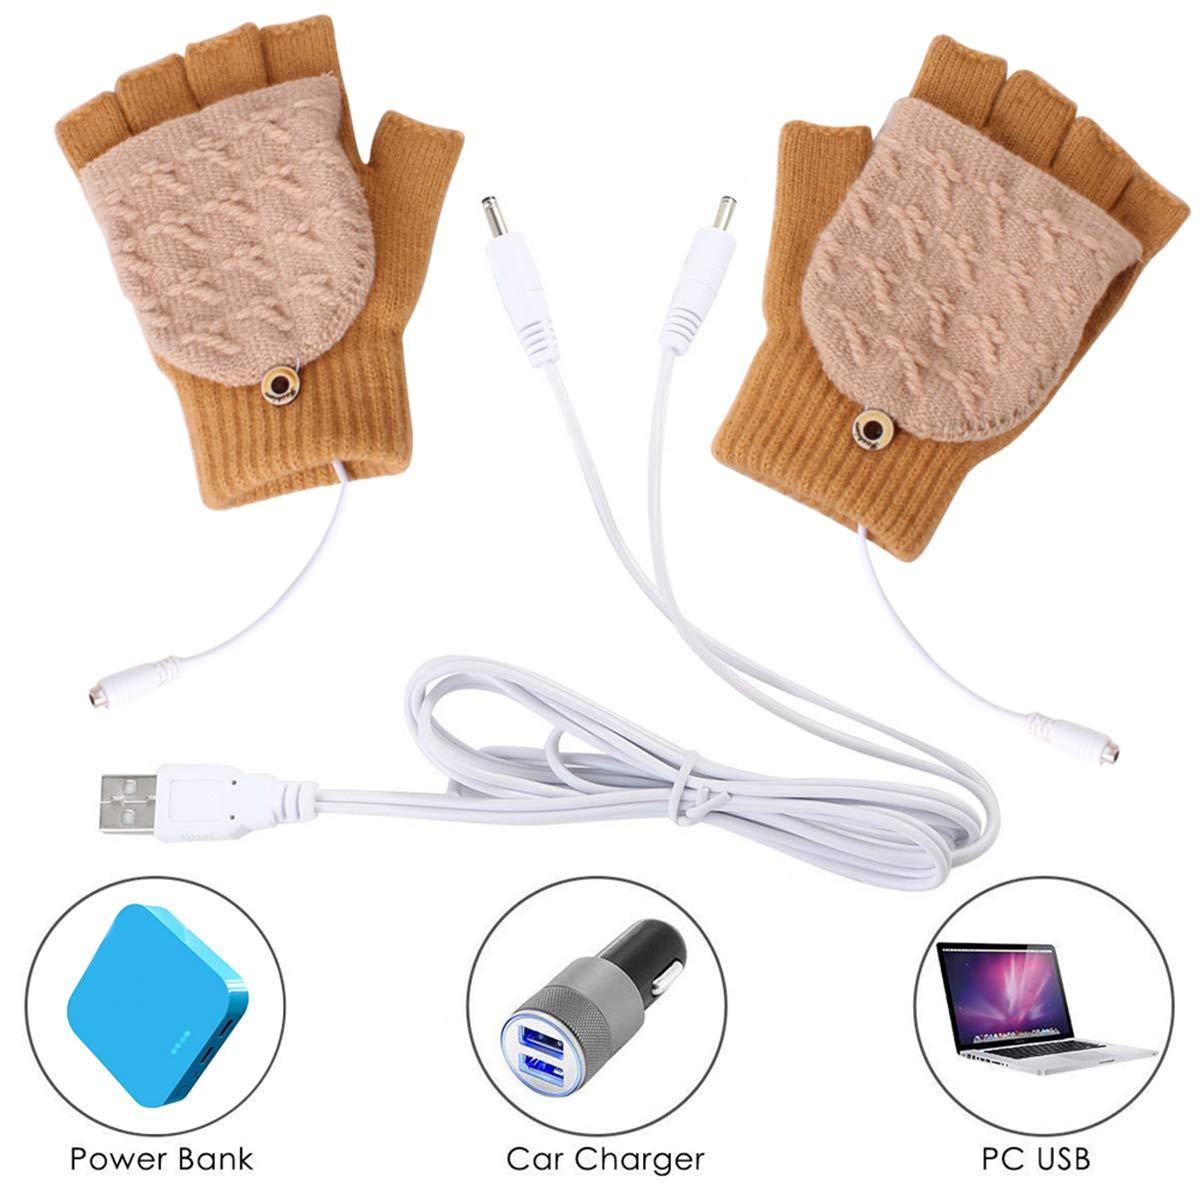 Winter Full /& Half Fingers Warmer Laptop Gloves Mittens for Women Men Girls Boys Petyoung Unisex USB Heated Gloves Best Winter Gift Choice